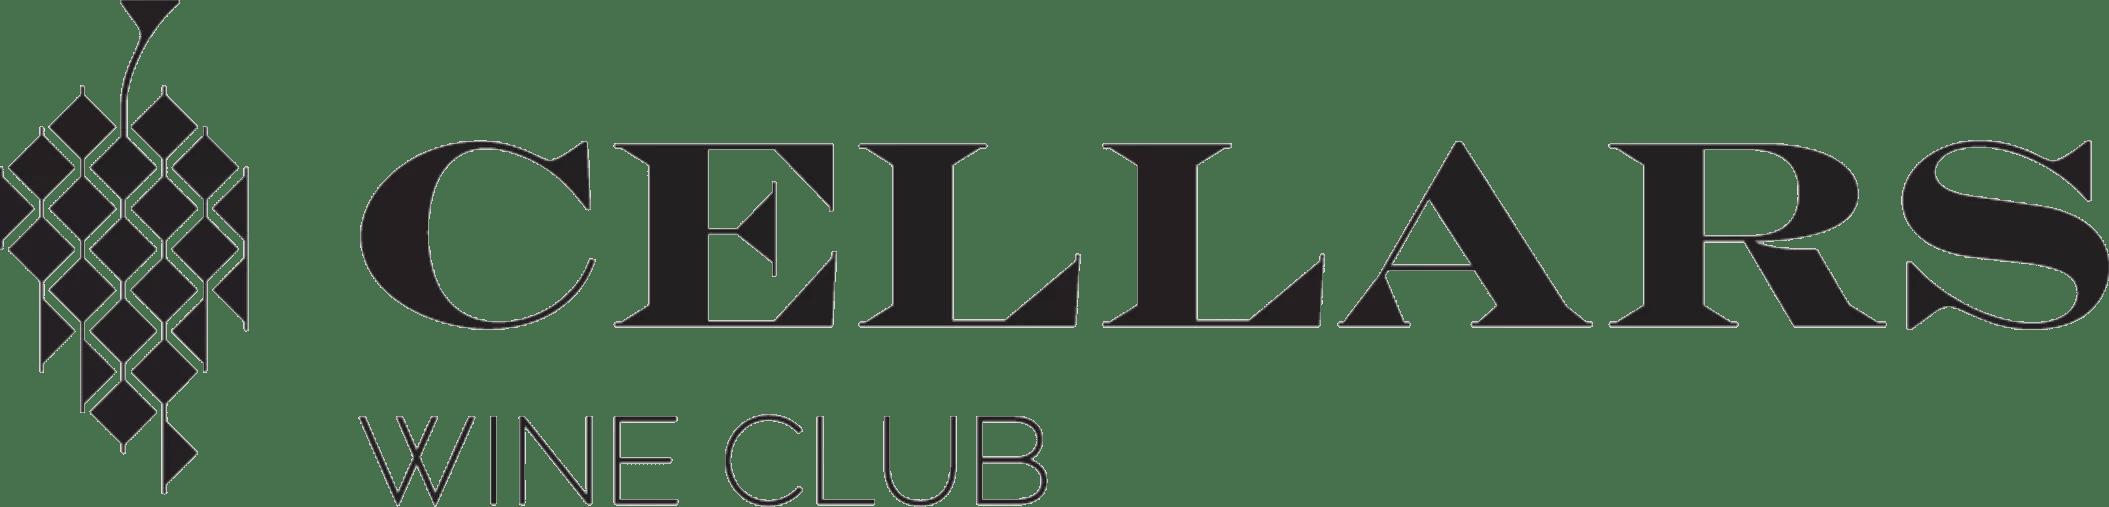 Cellars Sparkling Wine Club